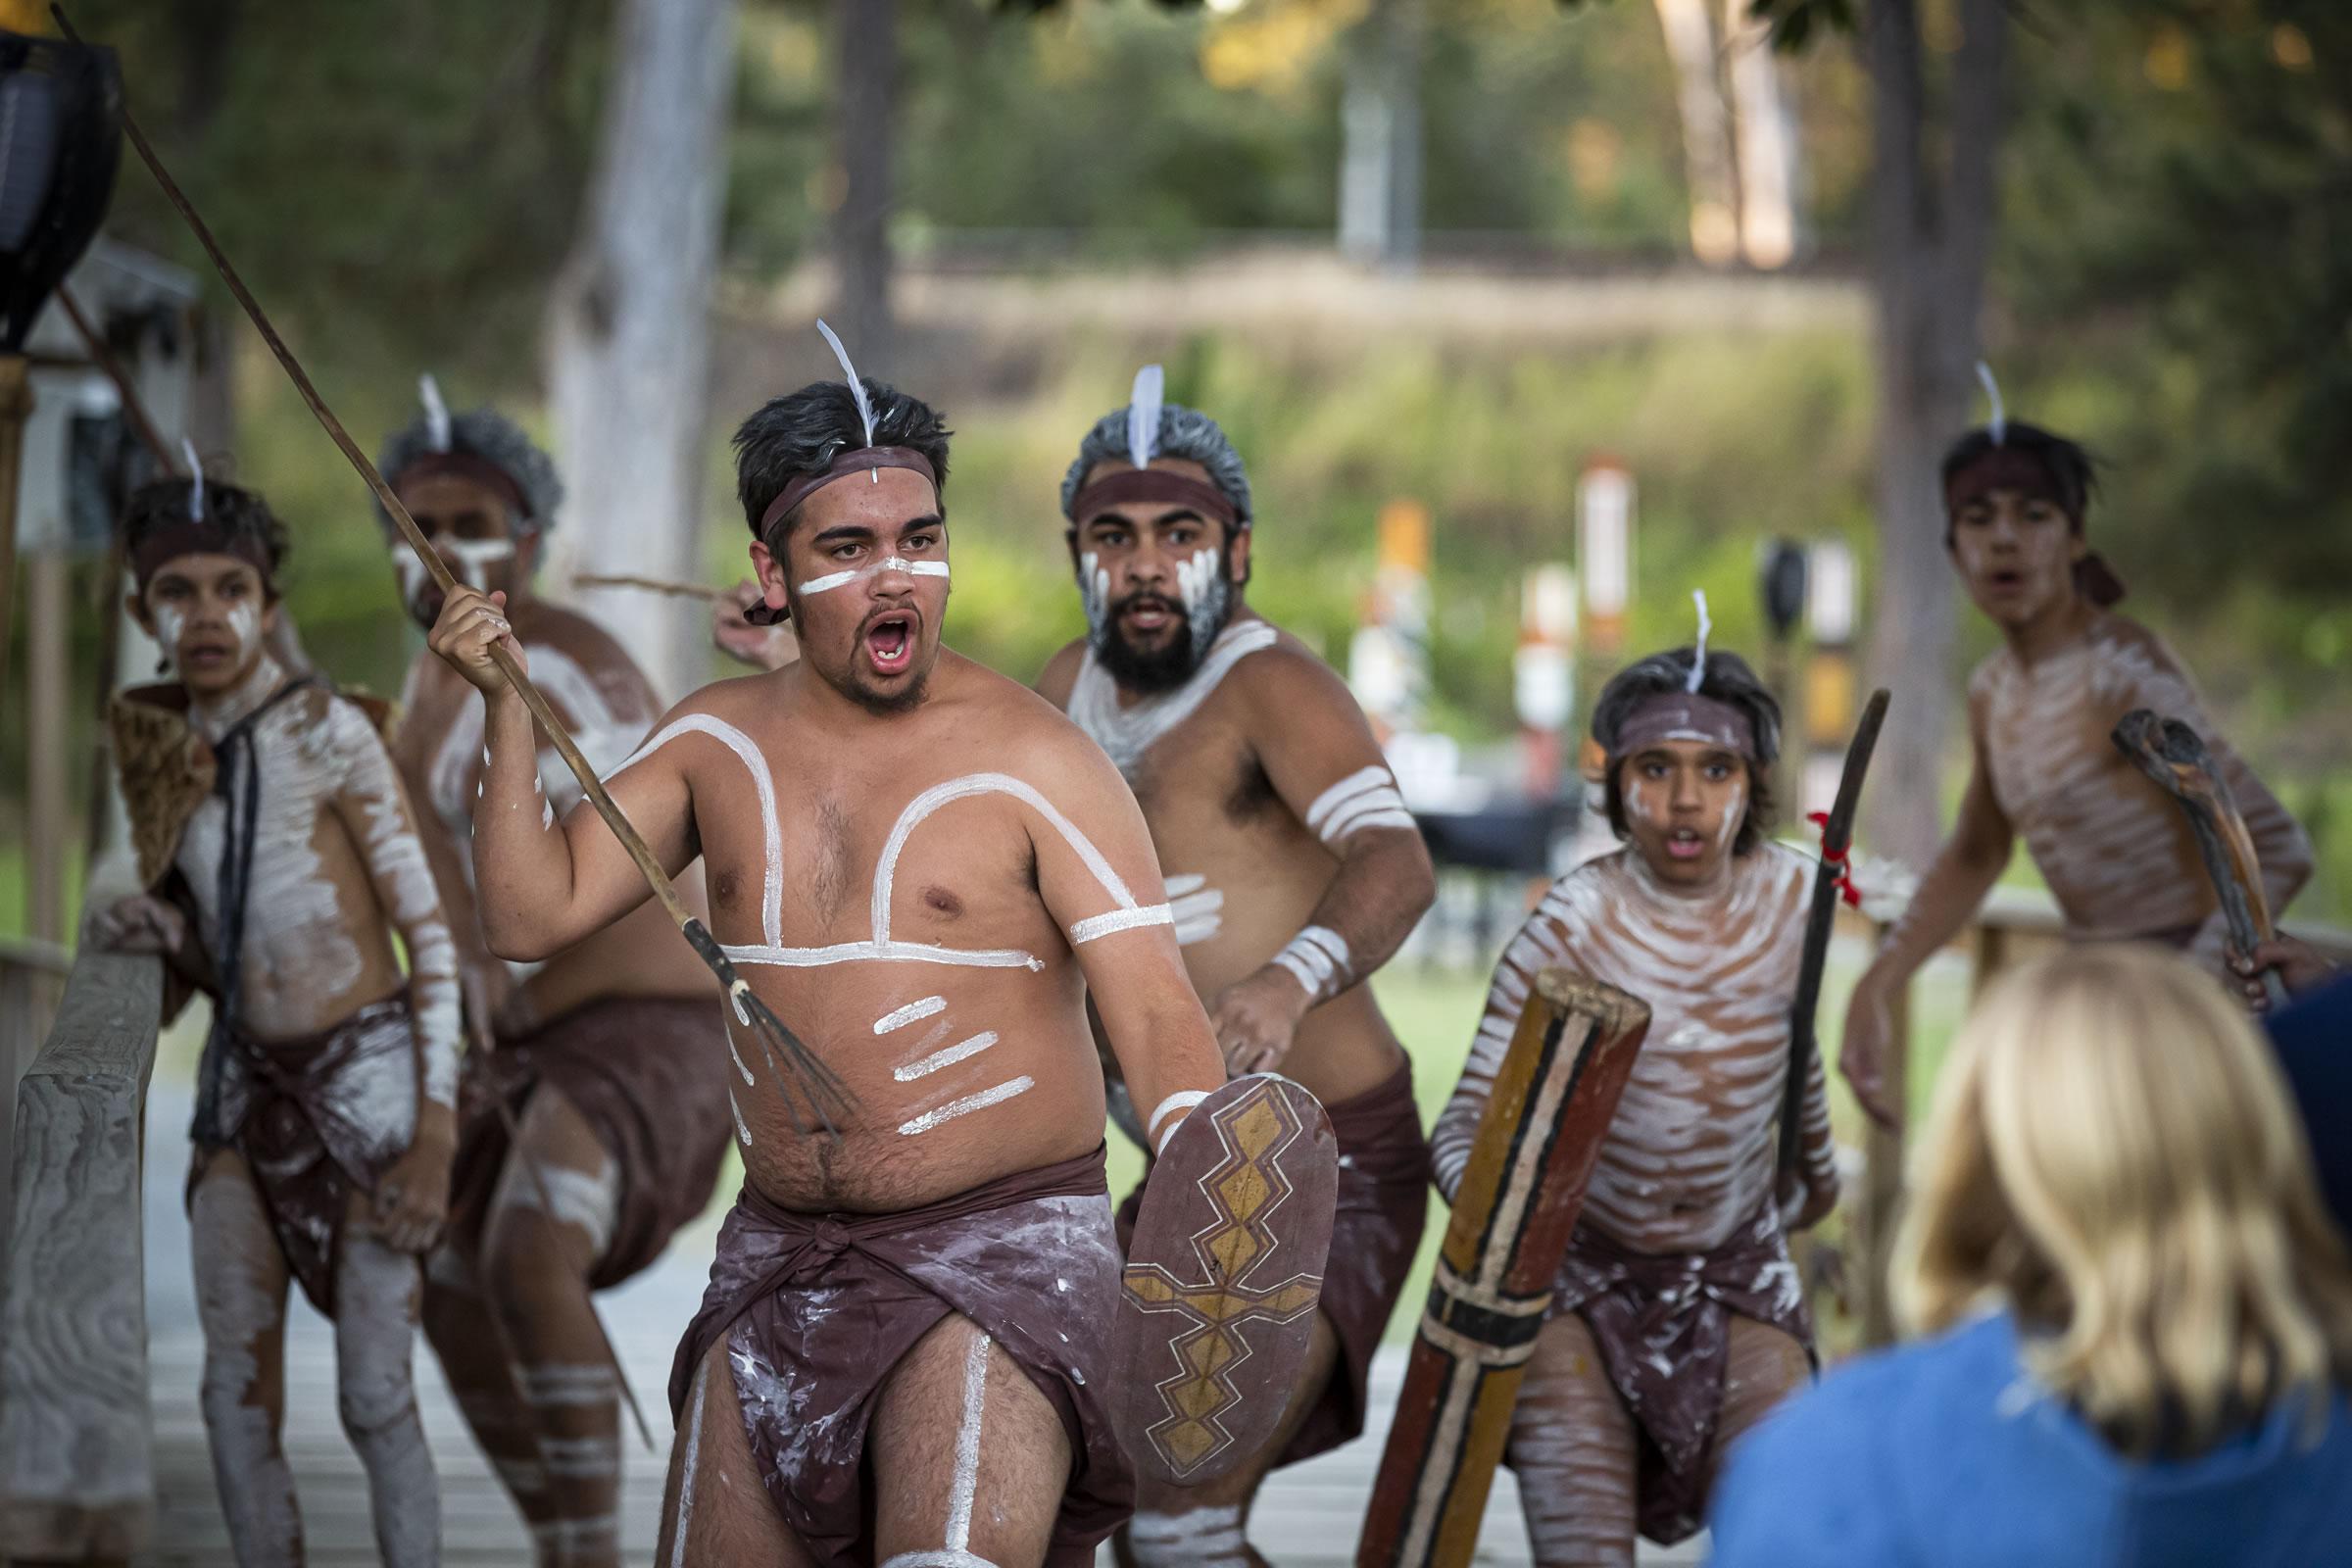 Spirits of the Red Sand aboriginal performance, Brisbane, Australia